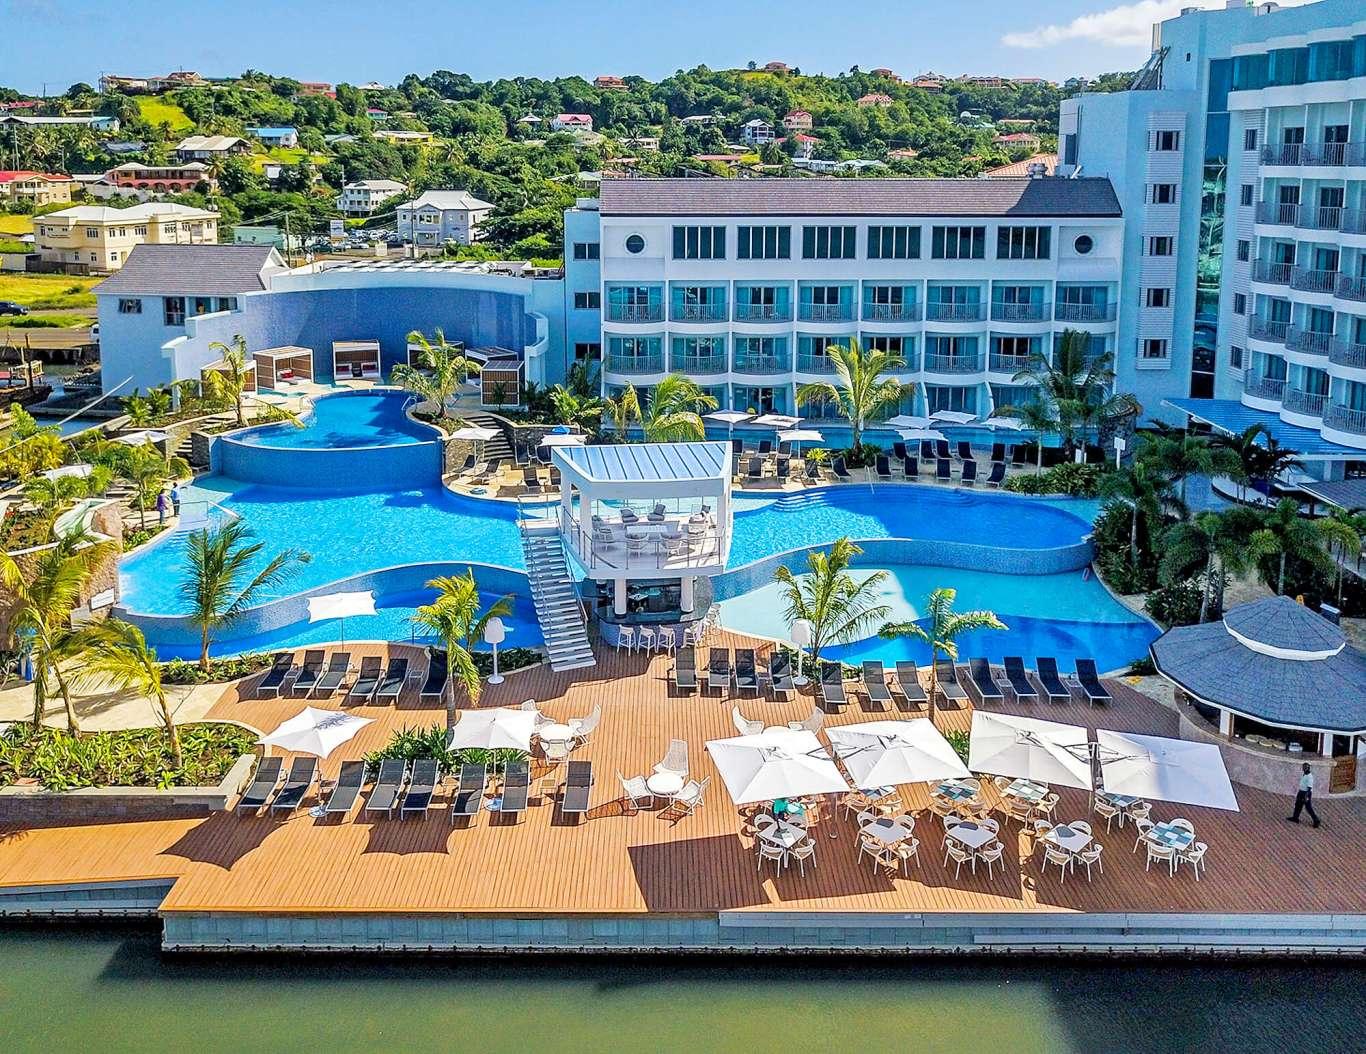 Harbor Club, Gros Islet, St Lucia